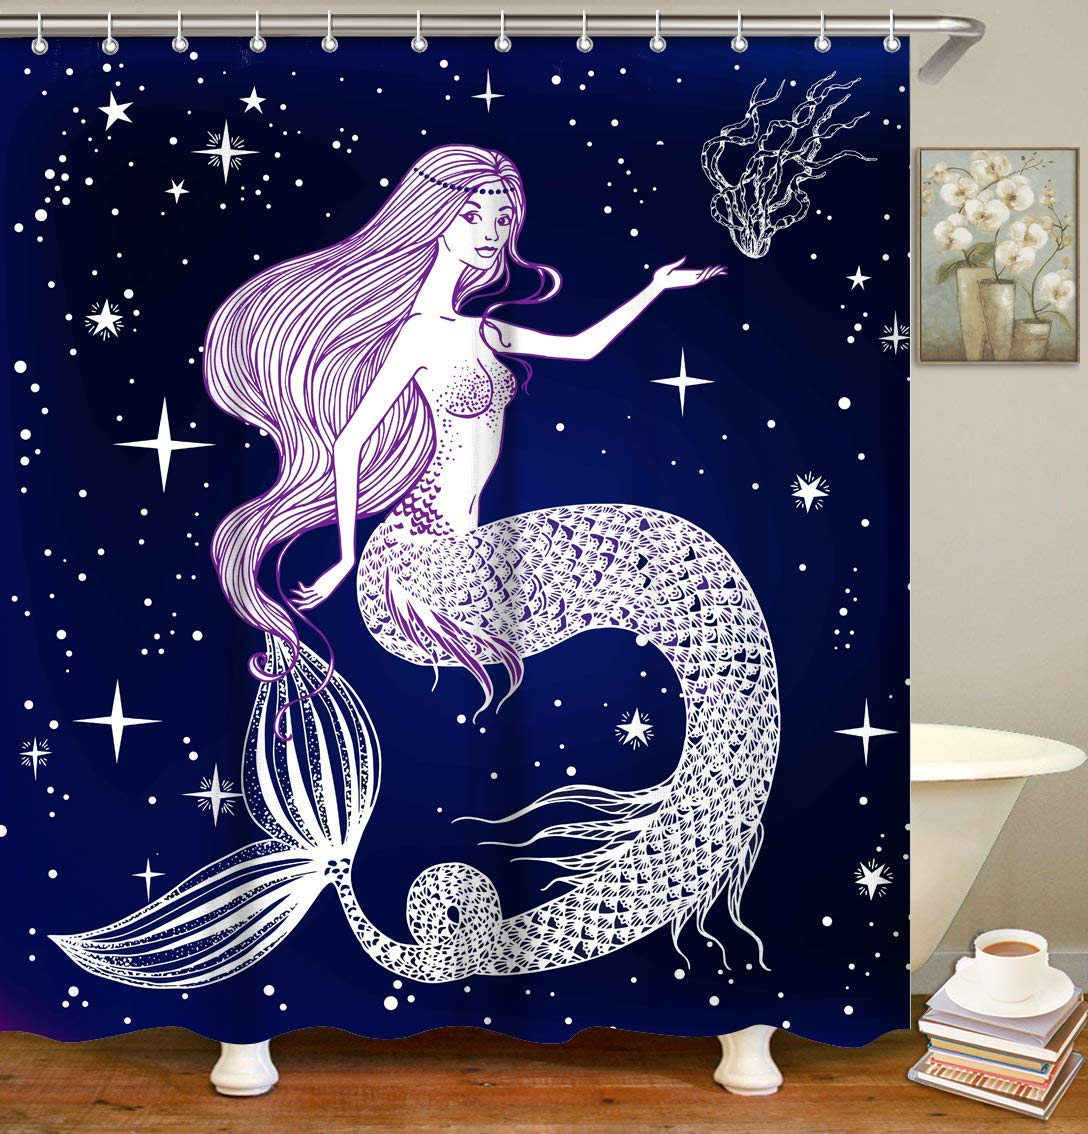 2019 Mermaid Shower Curtain Set With 12 Hooks Fabric Bath Curtain Decorative Bathroom Accessories Home Decoration Purple From Ptdiy2 19 65